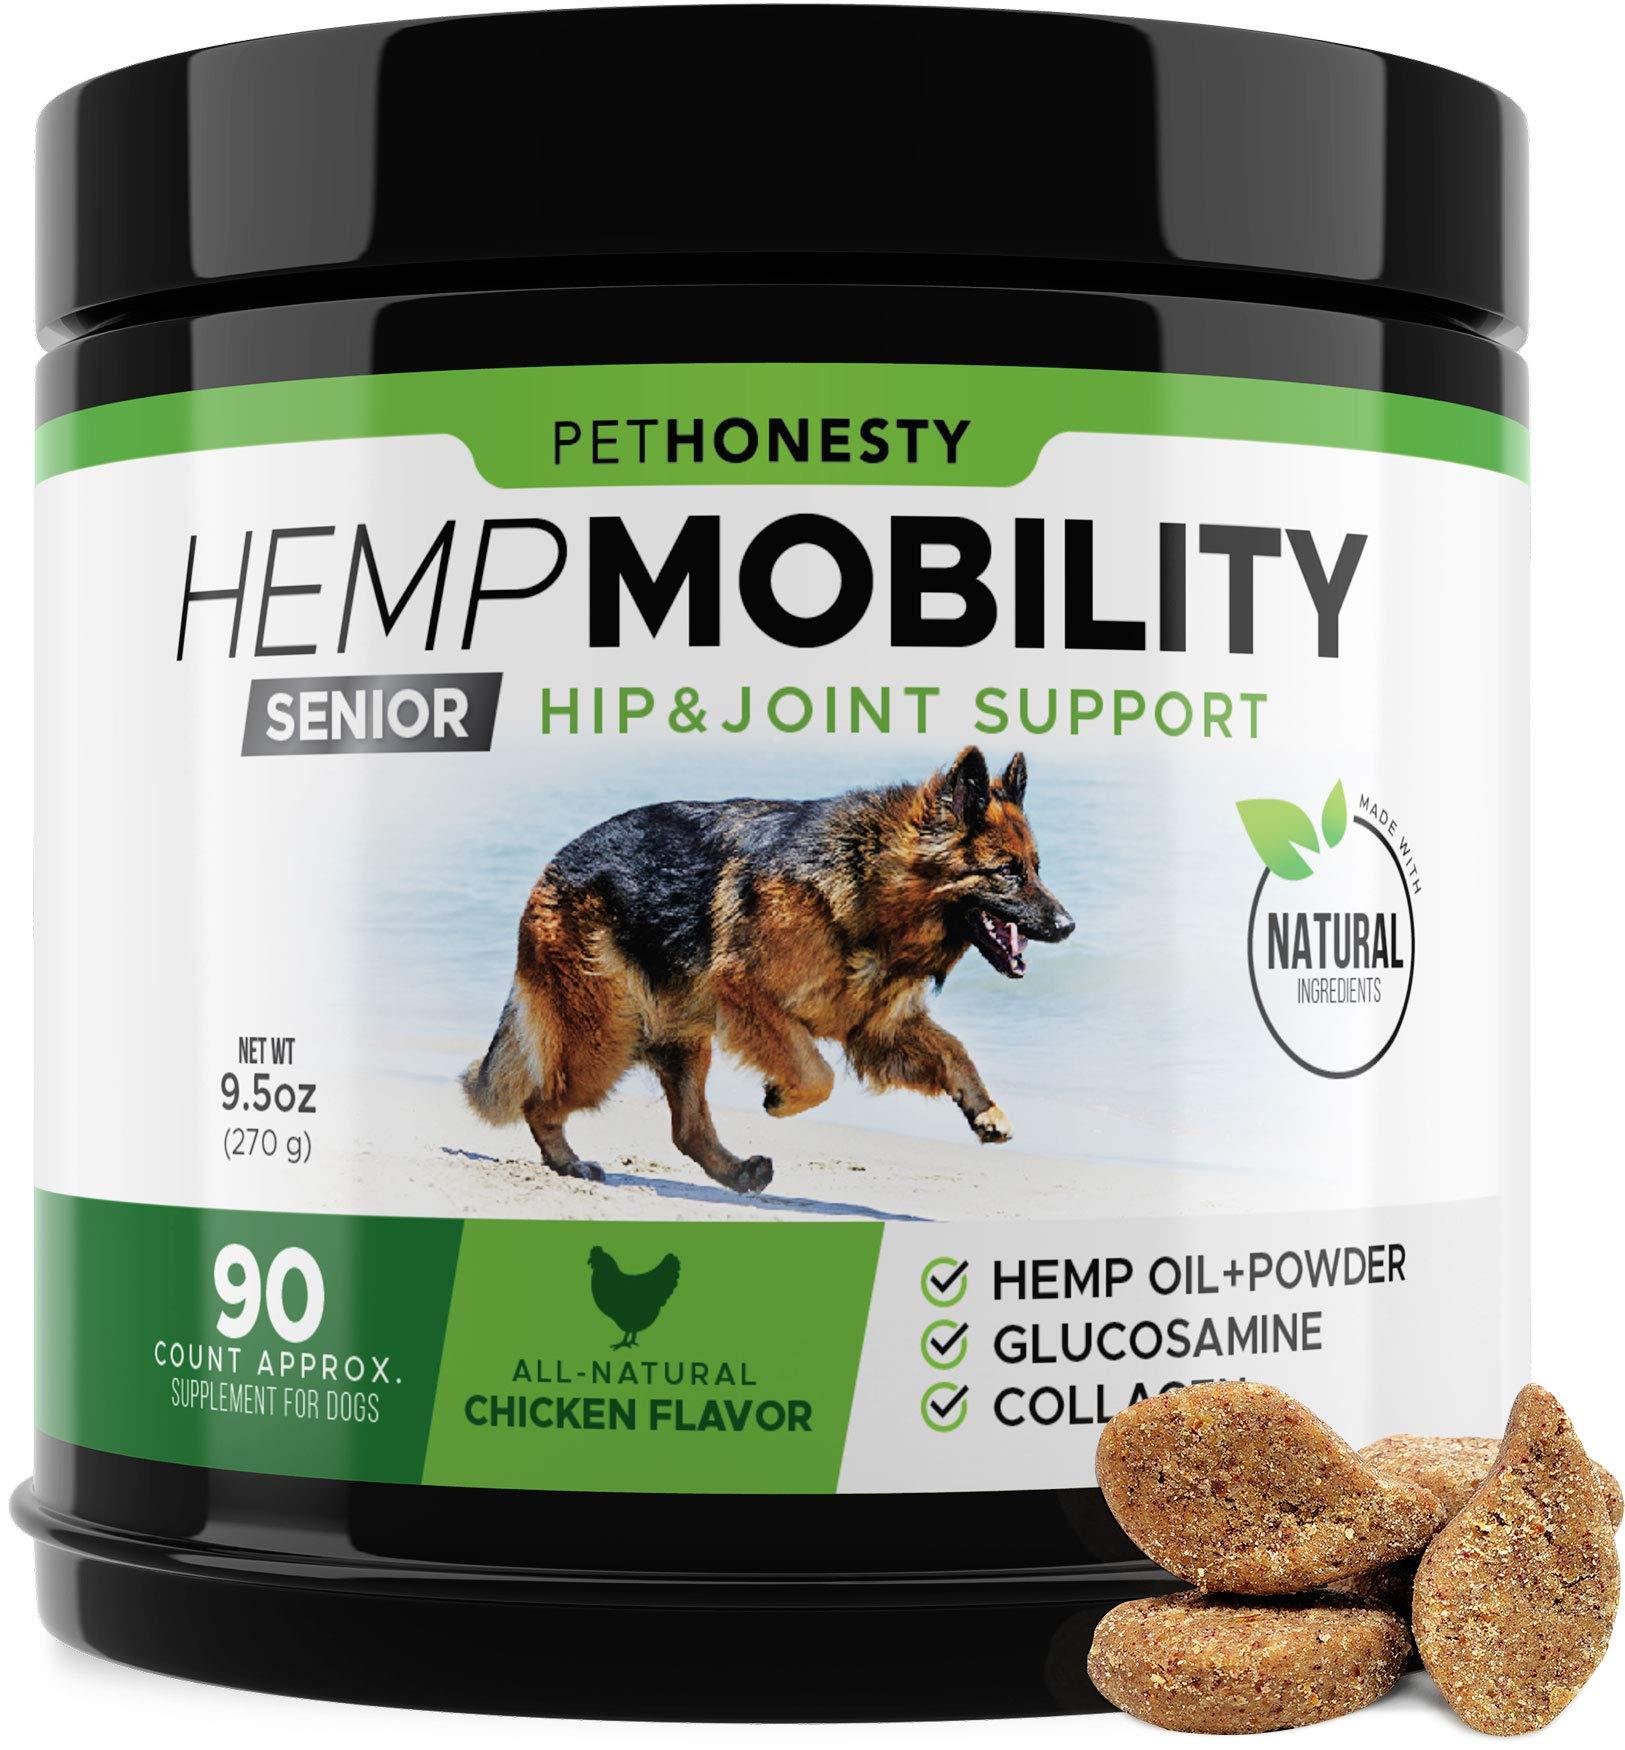 Senior Hemp Mobility - Hip & Joint Supplement for Senior Dogs - with Hemp Oil & Hemp Powder, Glucosamine, Collagen, MSM, Green Lipped Mussel, Dog Treats Improve Mobility, Reduces Discomfort - Chicken